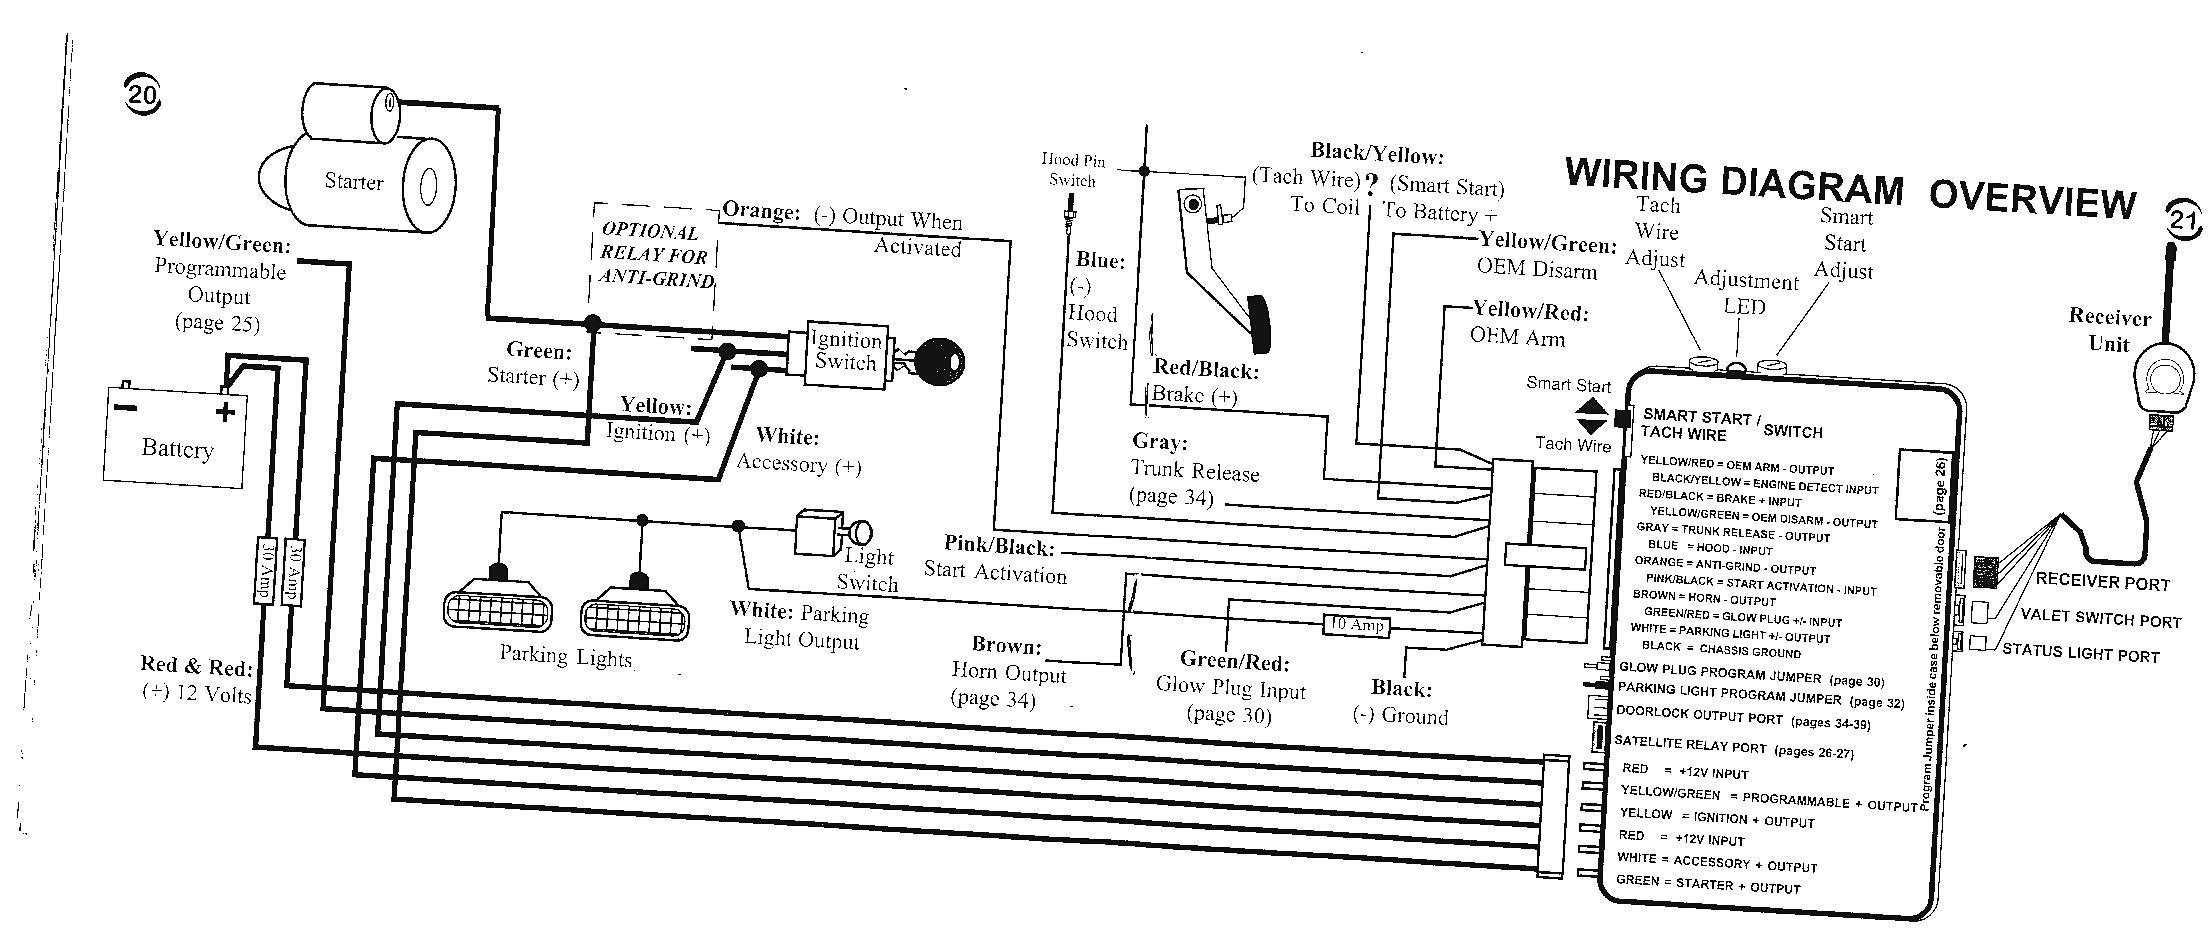 code alarm wiring diagrams list of wiring diagrams car stereo wiring diagram avital alarm wiring diagrams wiring